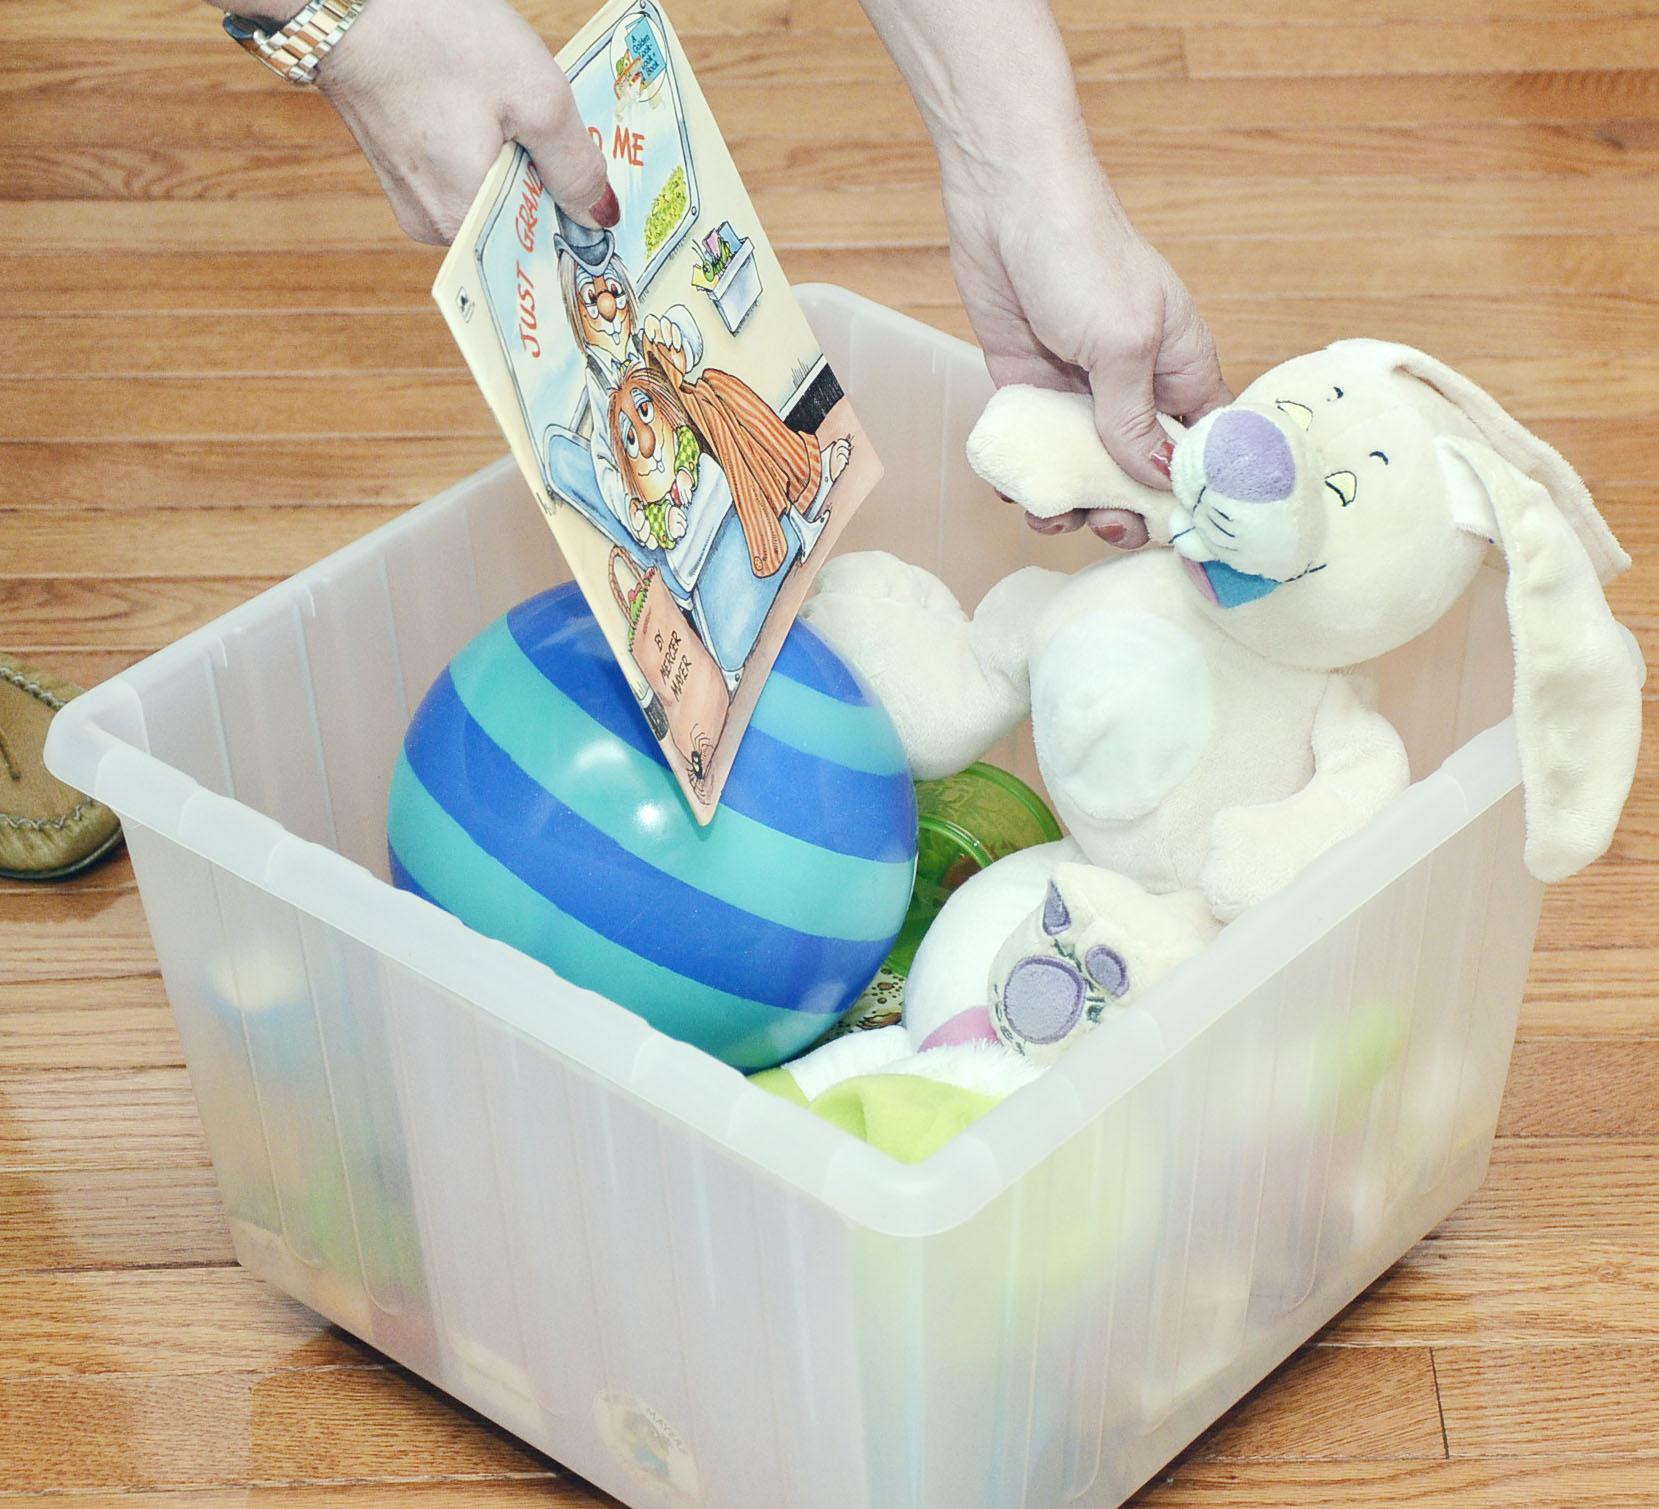 Put toys in plastic bins on wheels